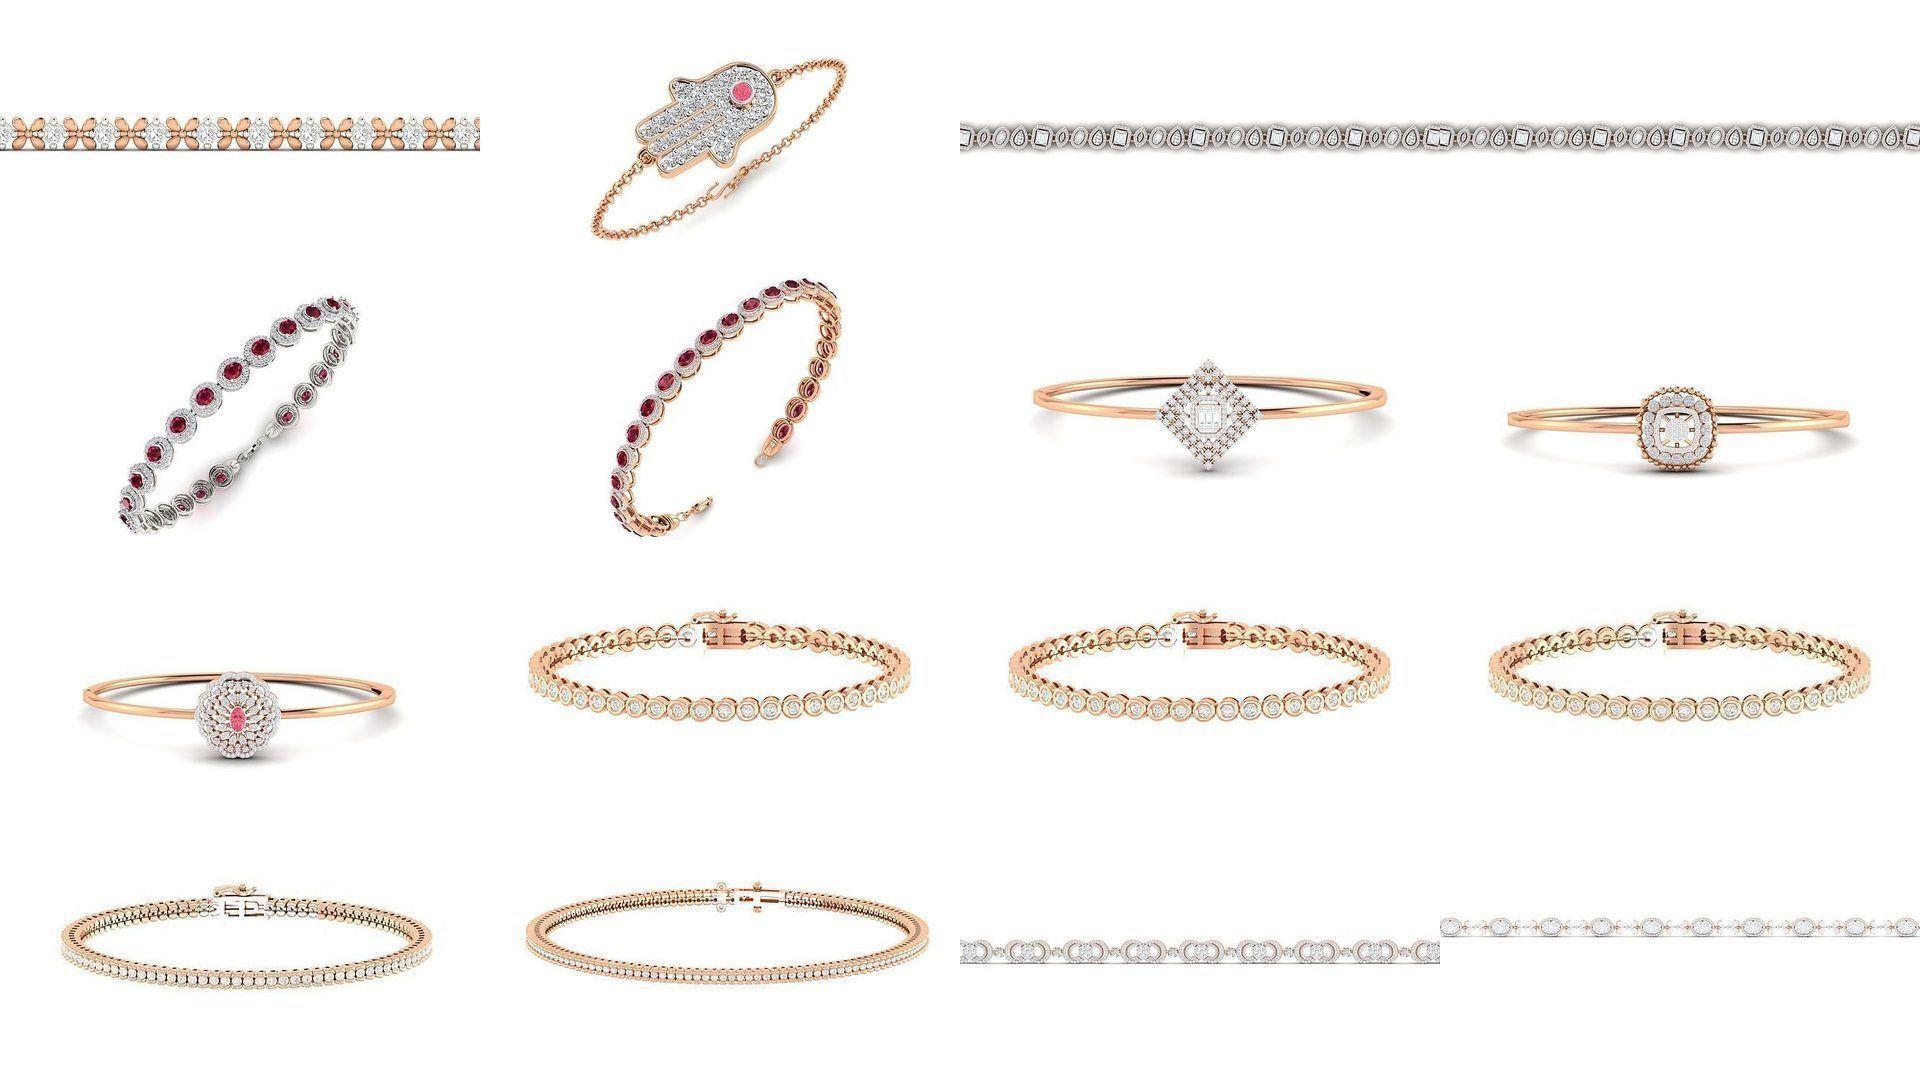 56 Women bracelet 3dm stl render detail